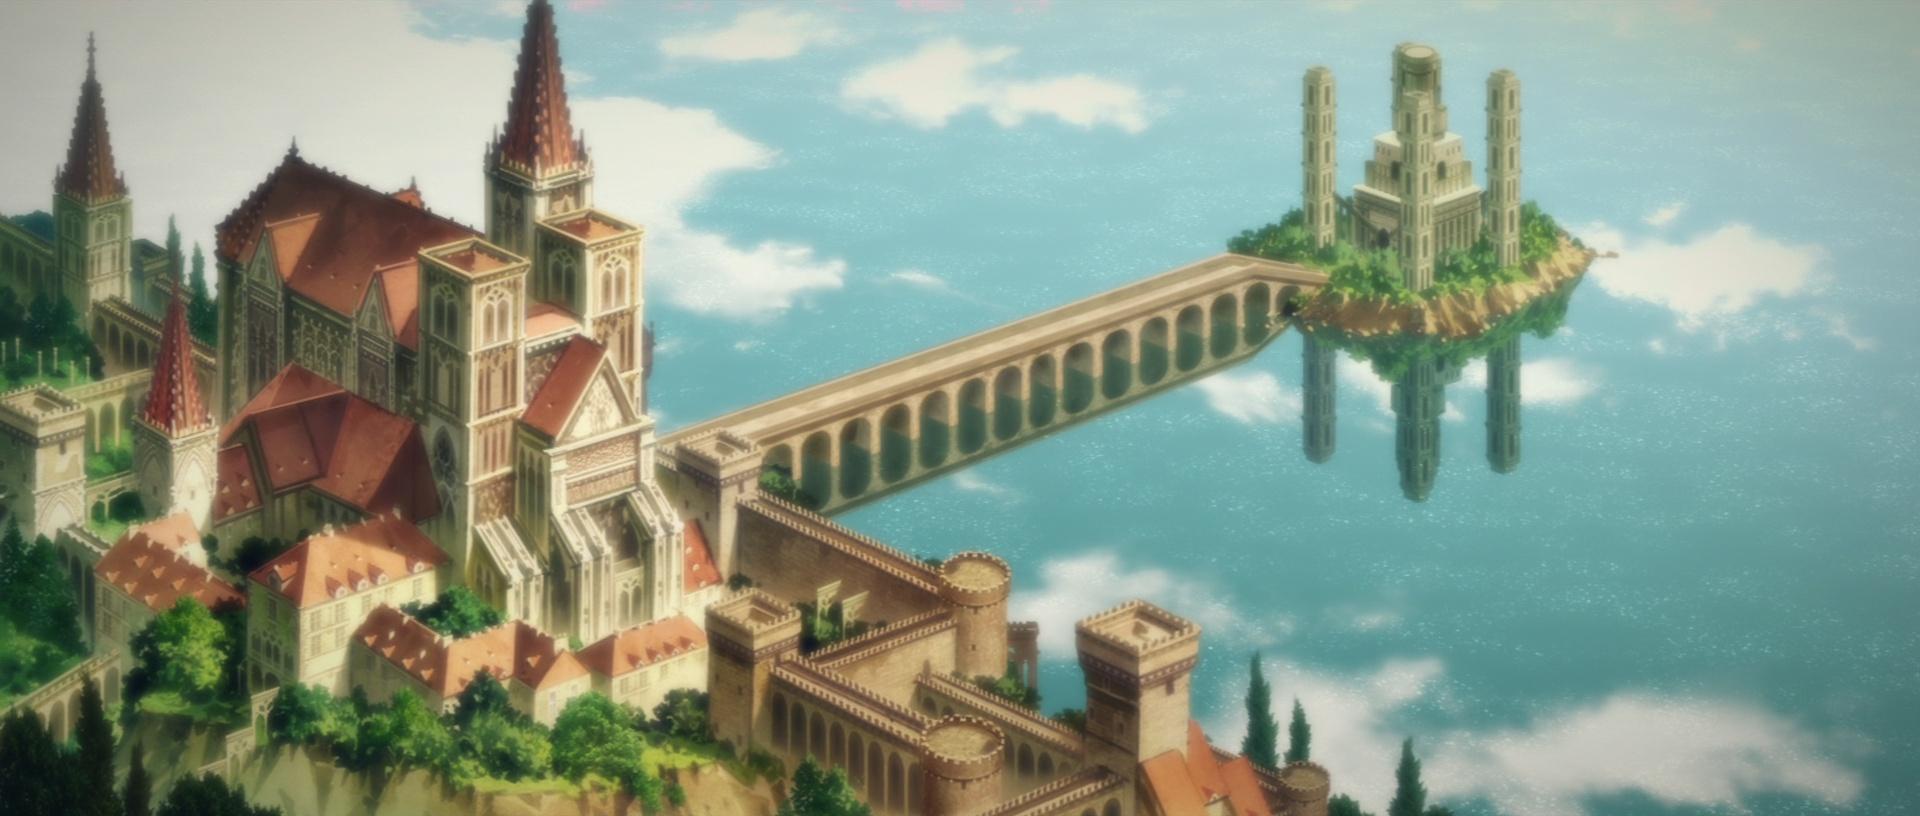 Kingdom of Vazelia